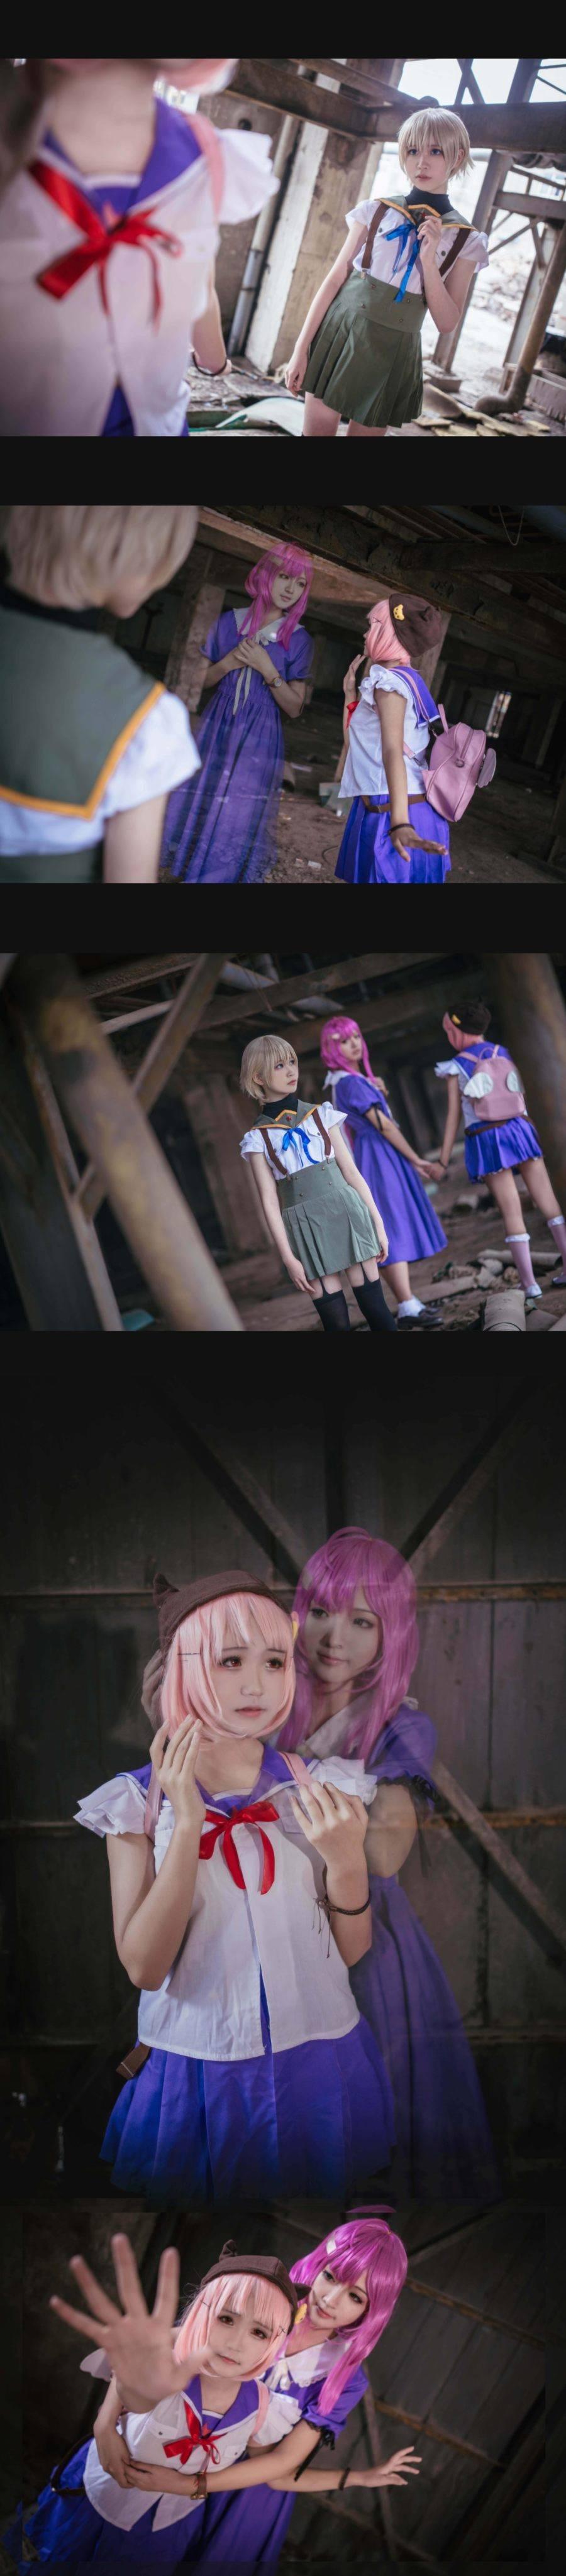 cosplay:《学园孤岛》佐仓慈_苏苏